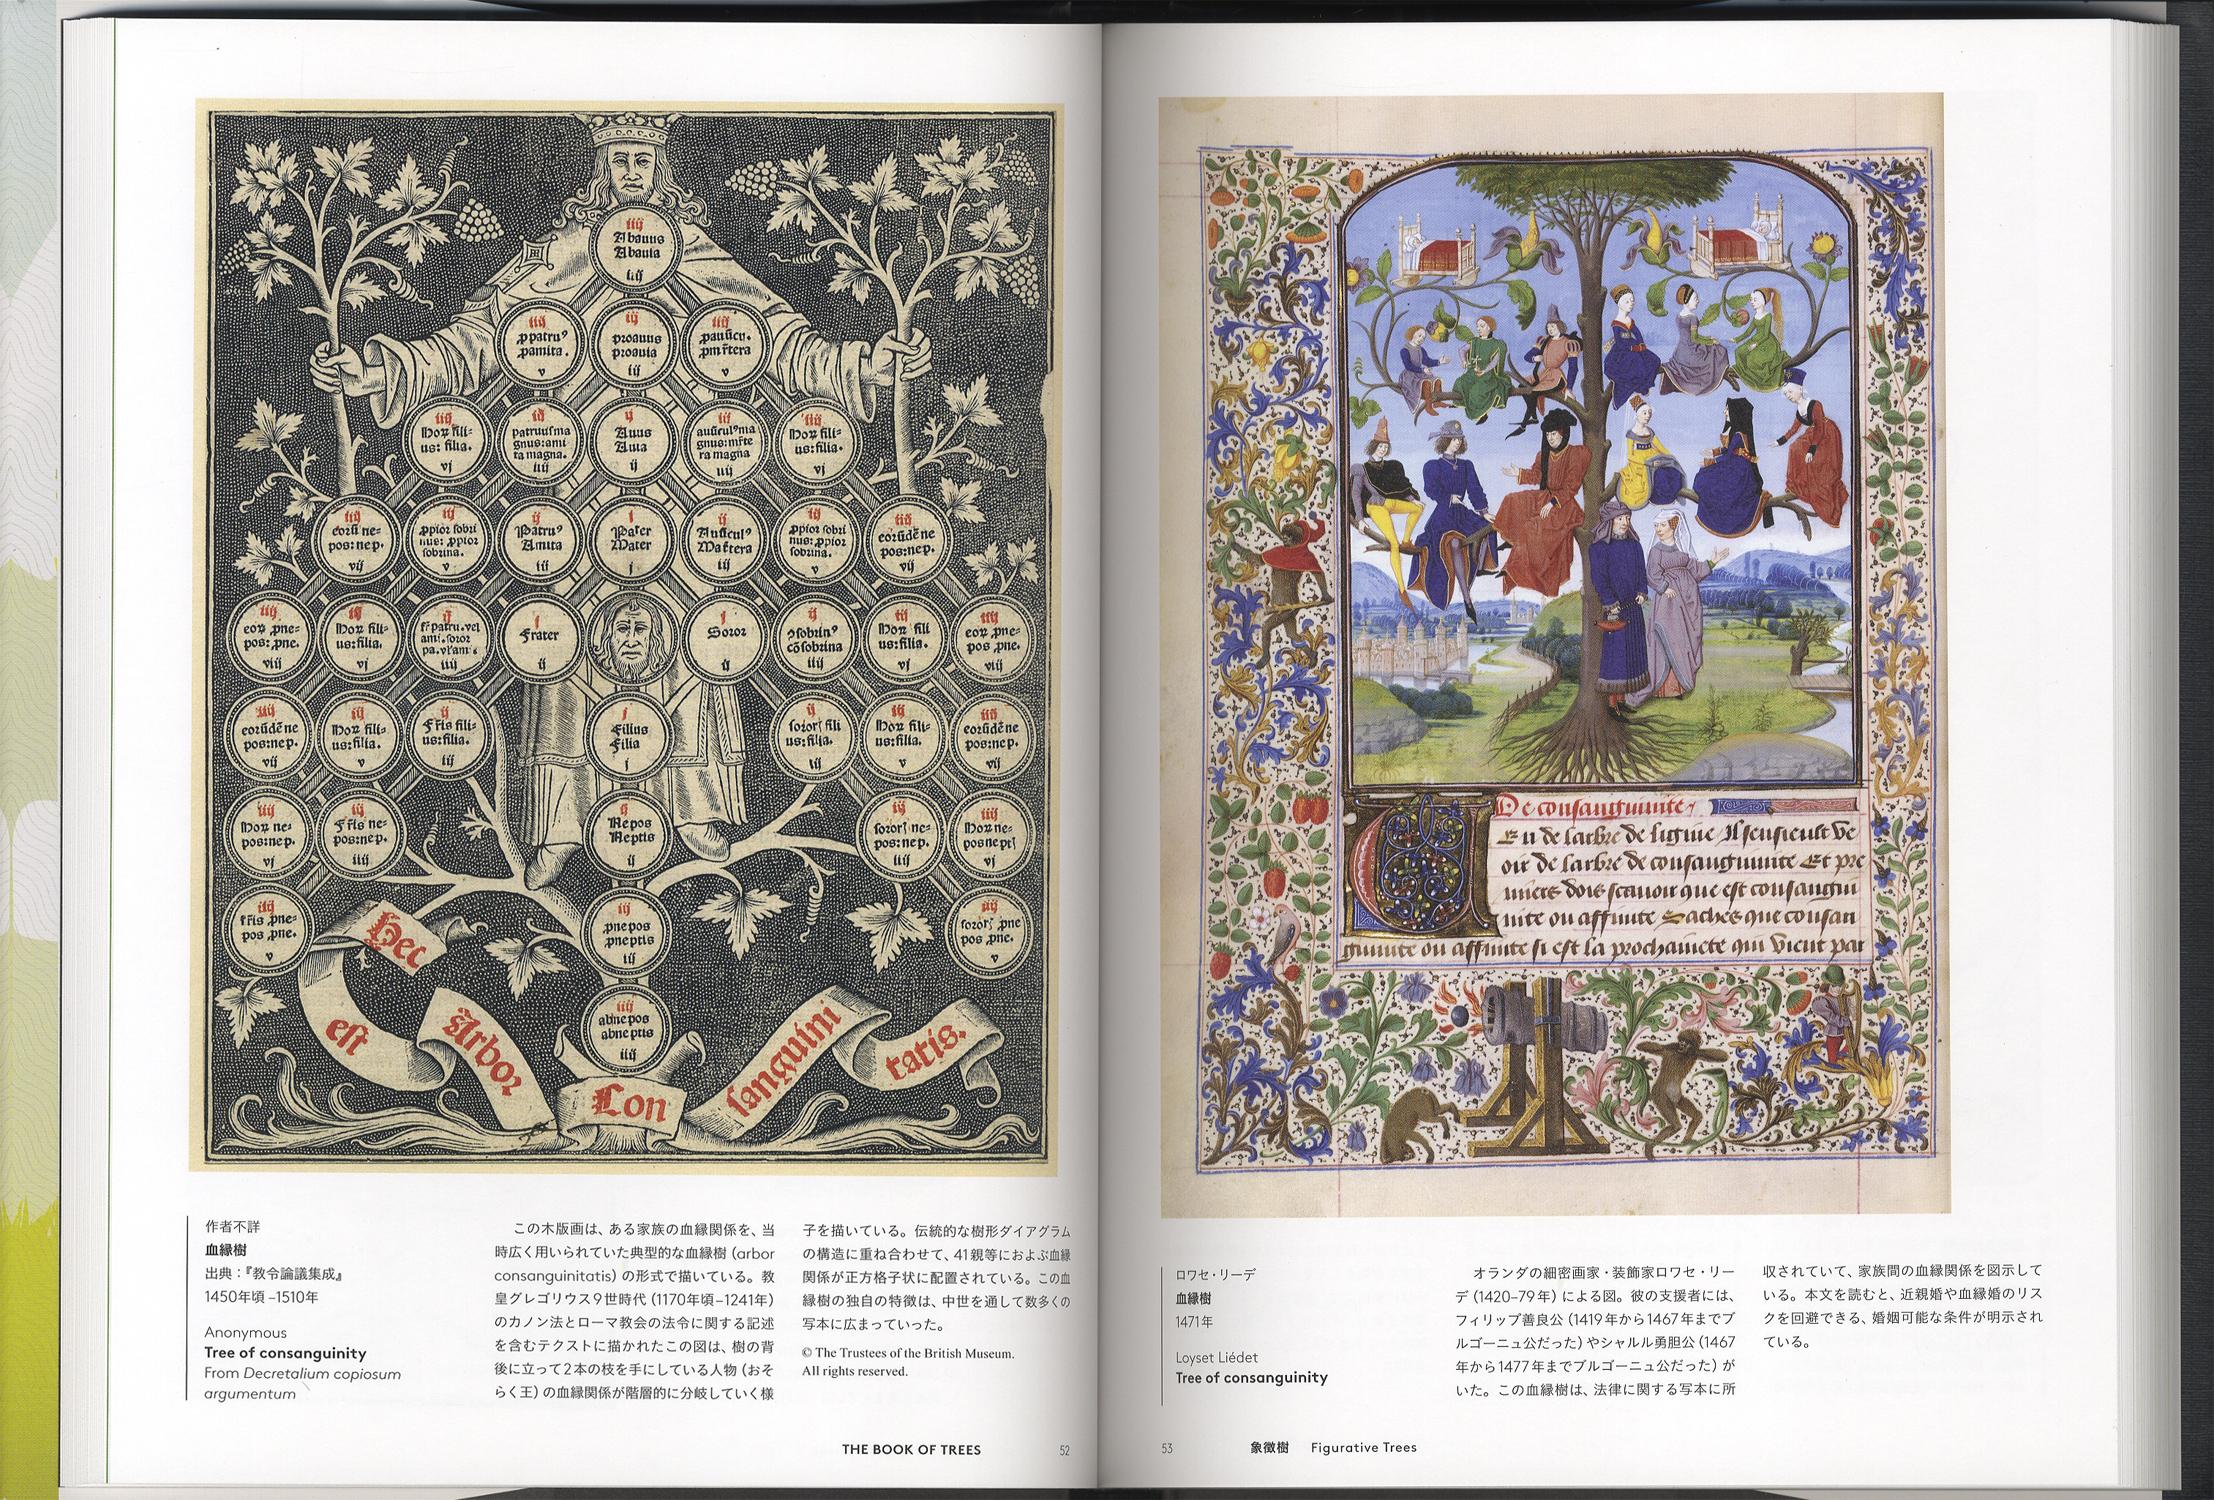 THE BOOK OF TREES 系統樹大全:知の世界を可視化するインフォグラフィックス[image3]